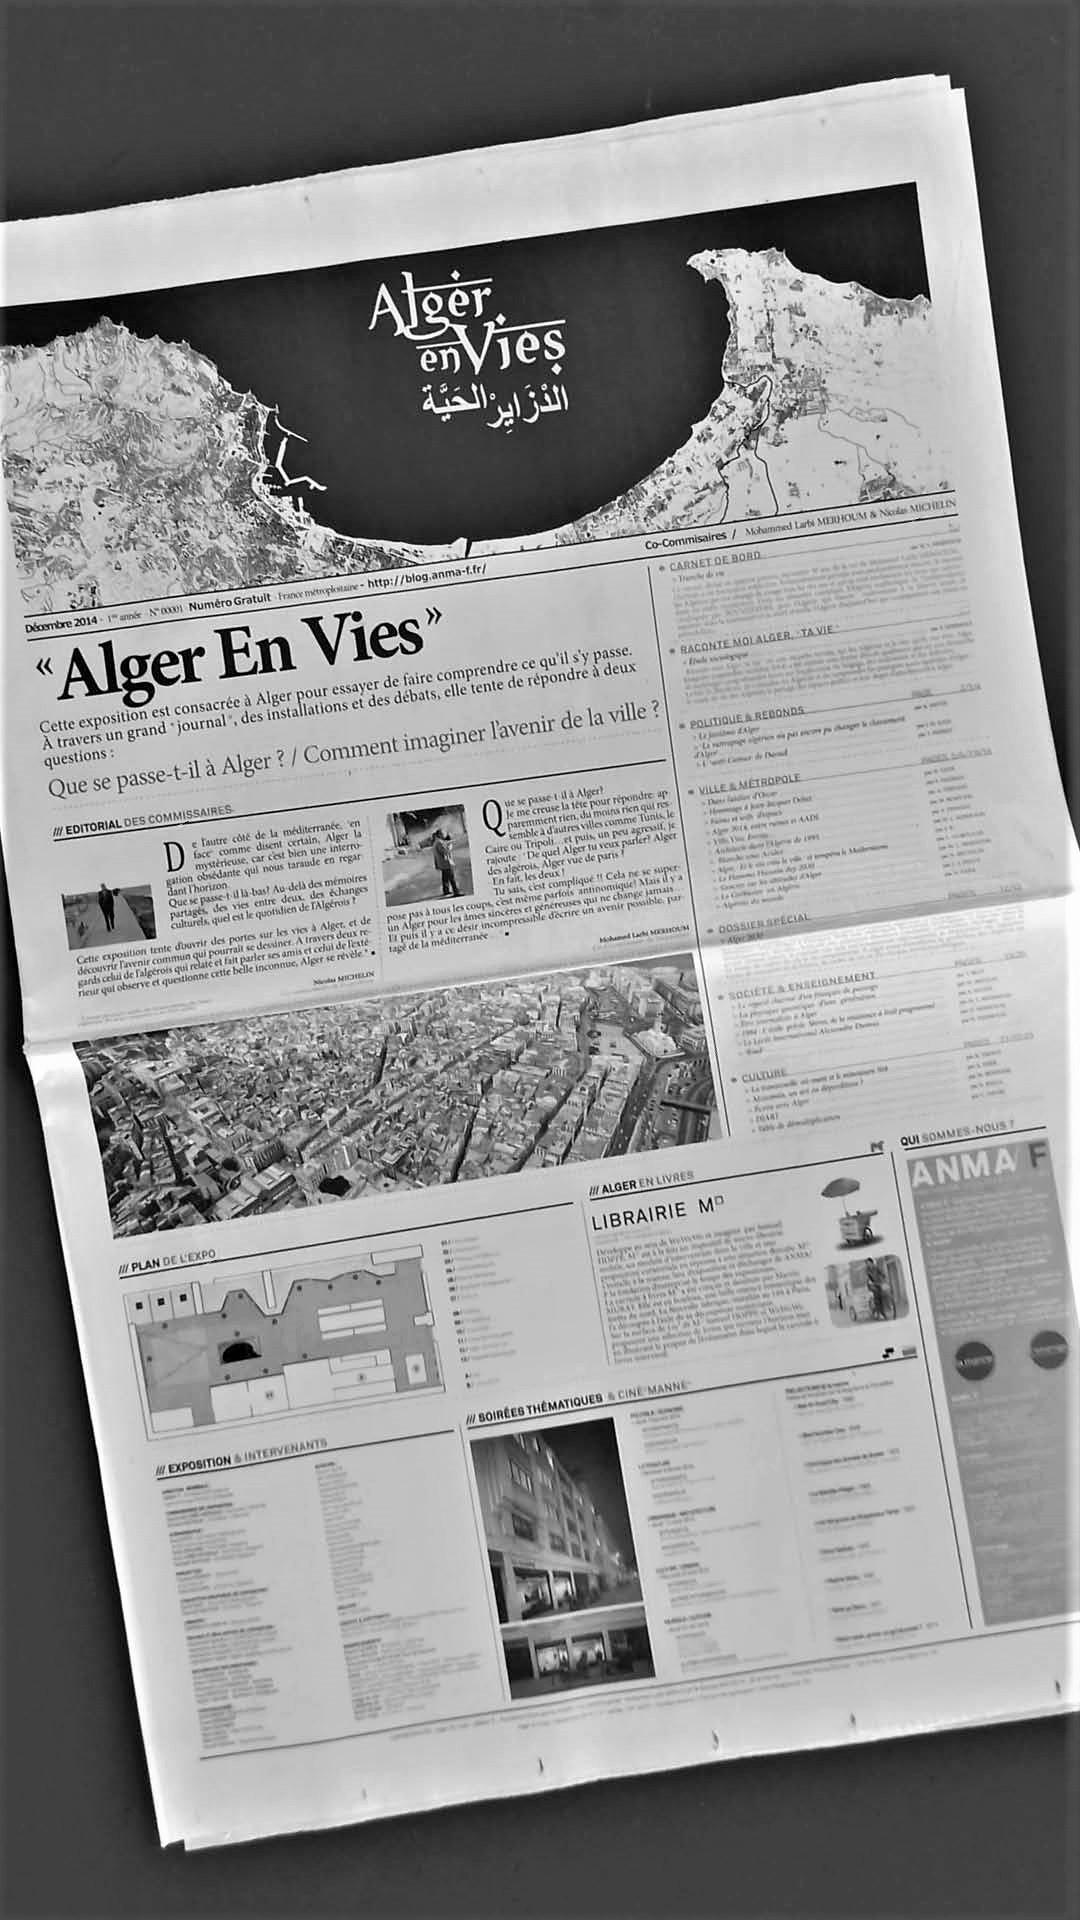 Alger en Vies